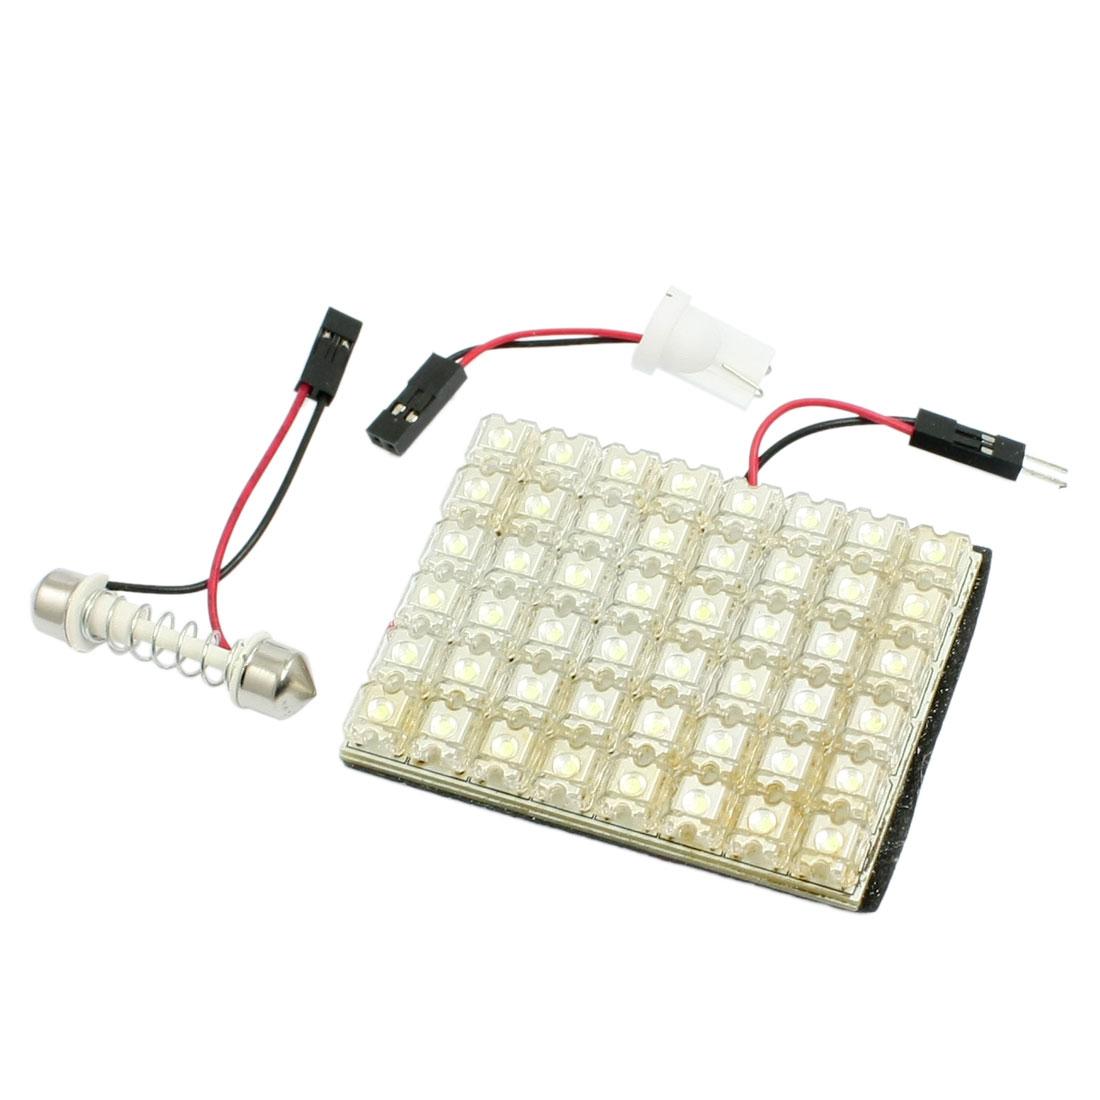 Car Auto 48 LED Light Panel Dome Festoon Interior Map Bulb White + T10 Adapter